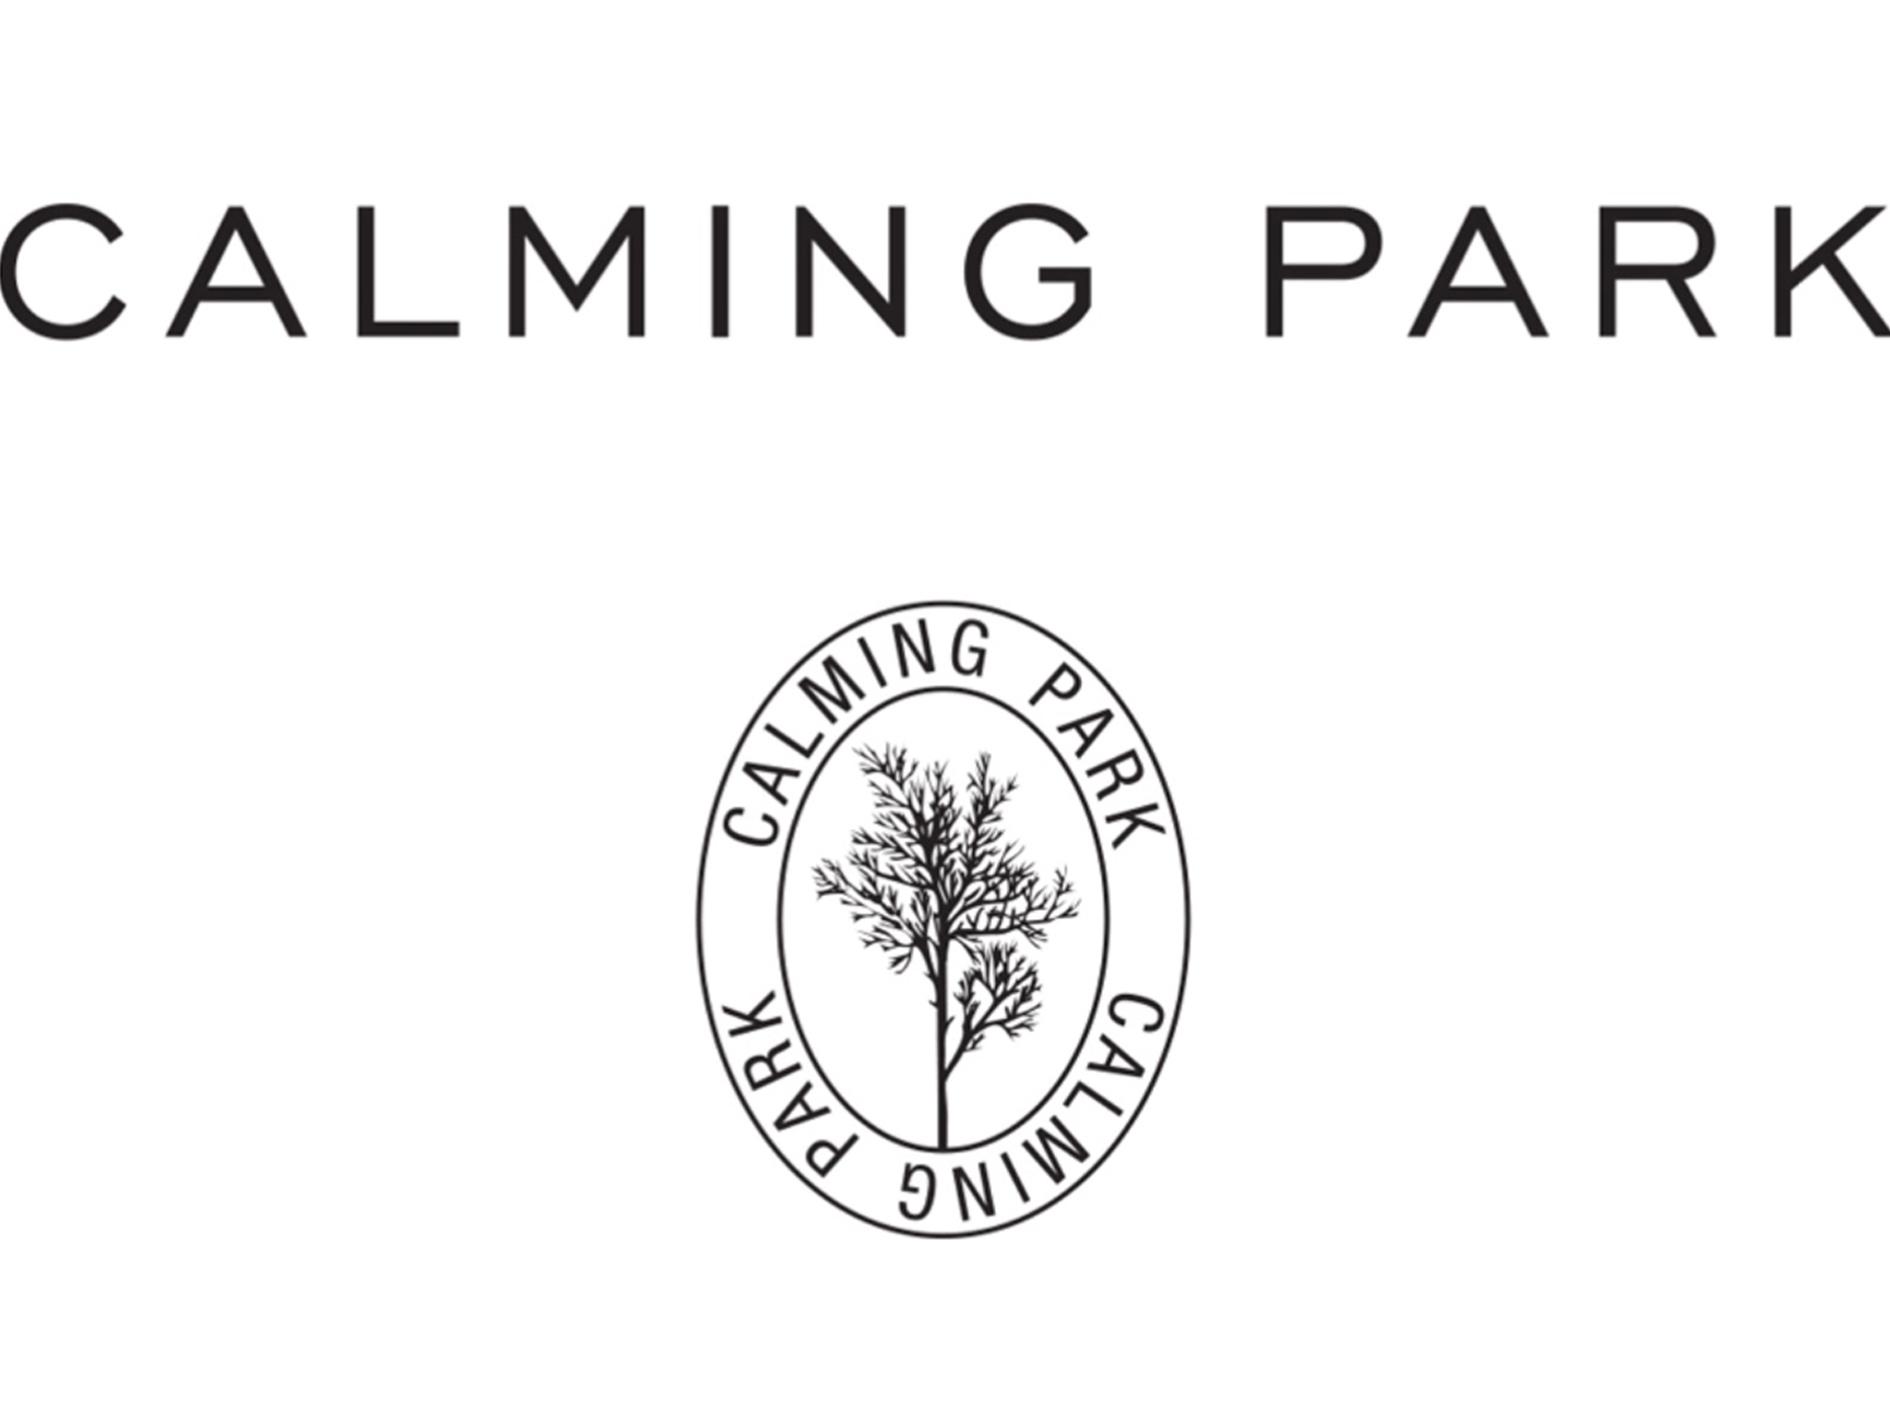 Calming Park